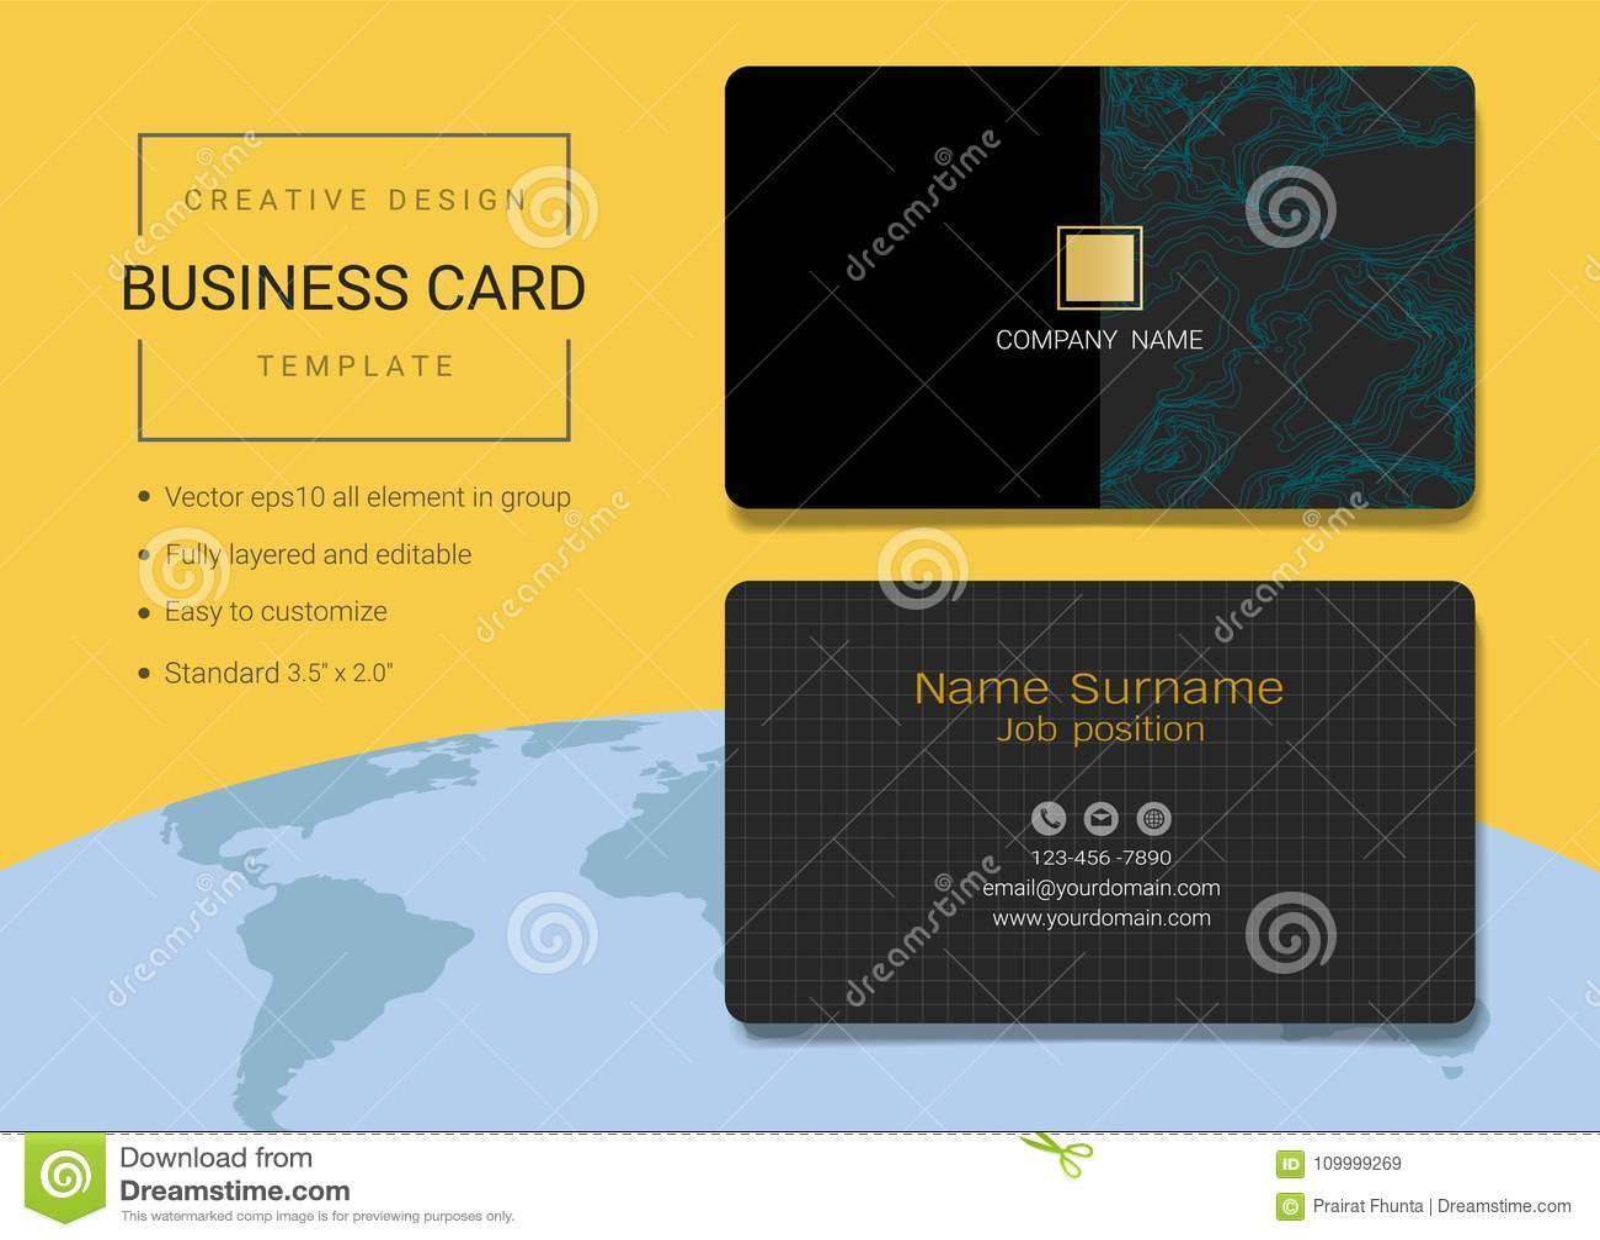 Creative Name Card Or Business Card Design Template. Stock Vector